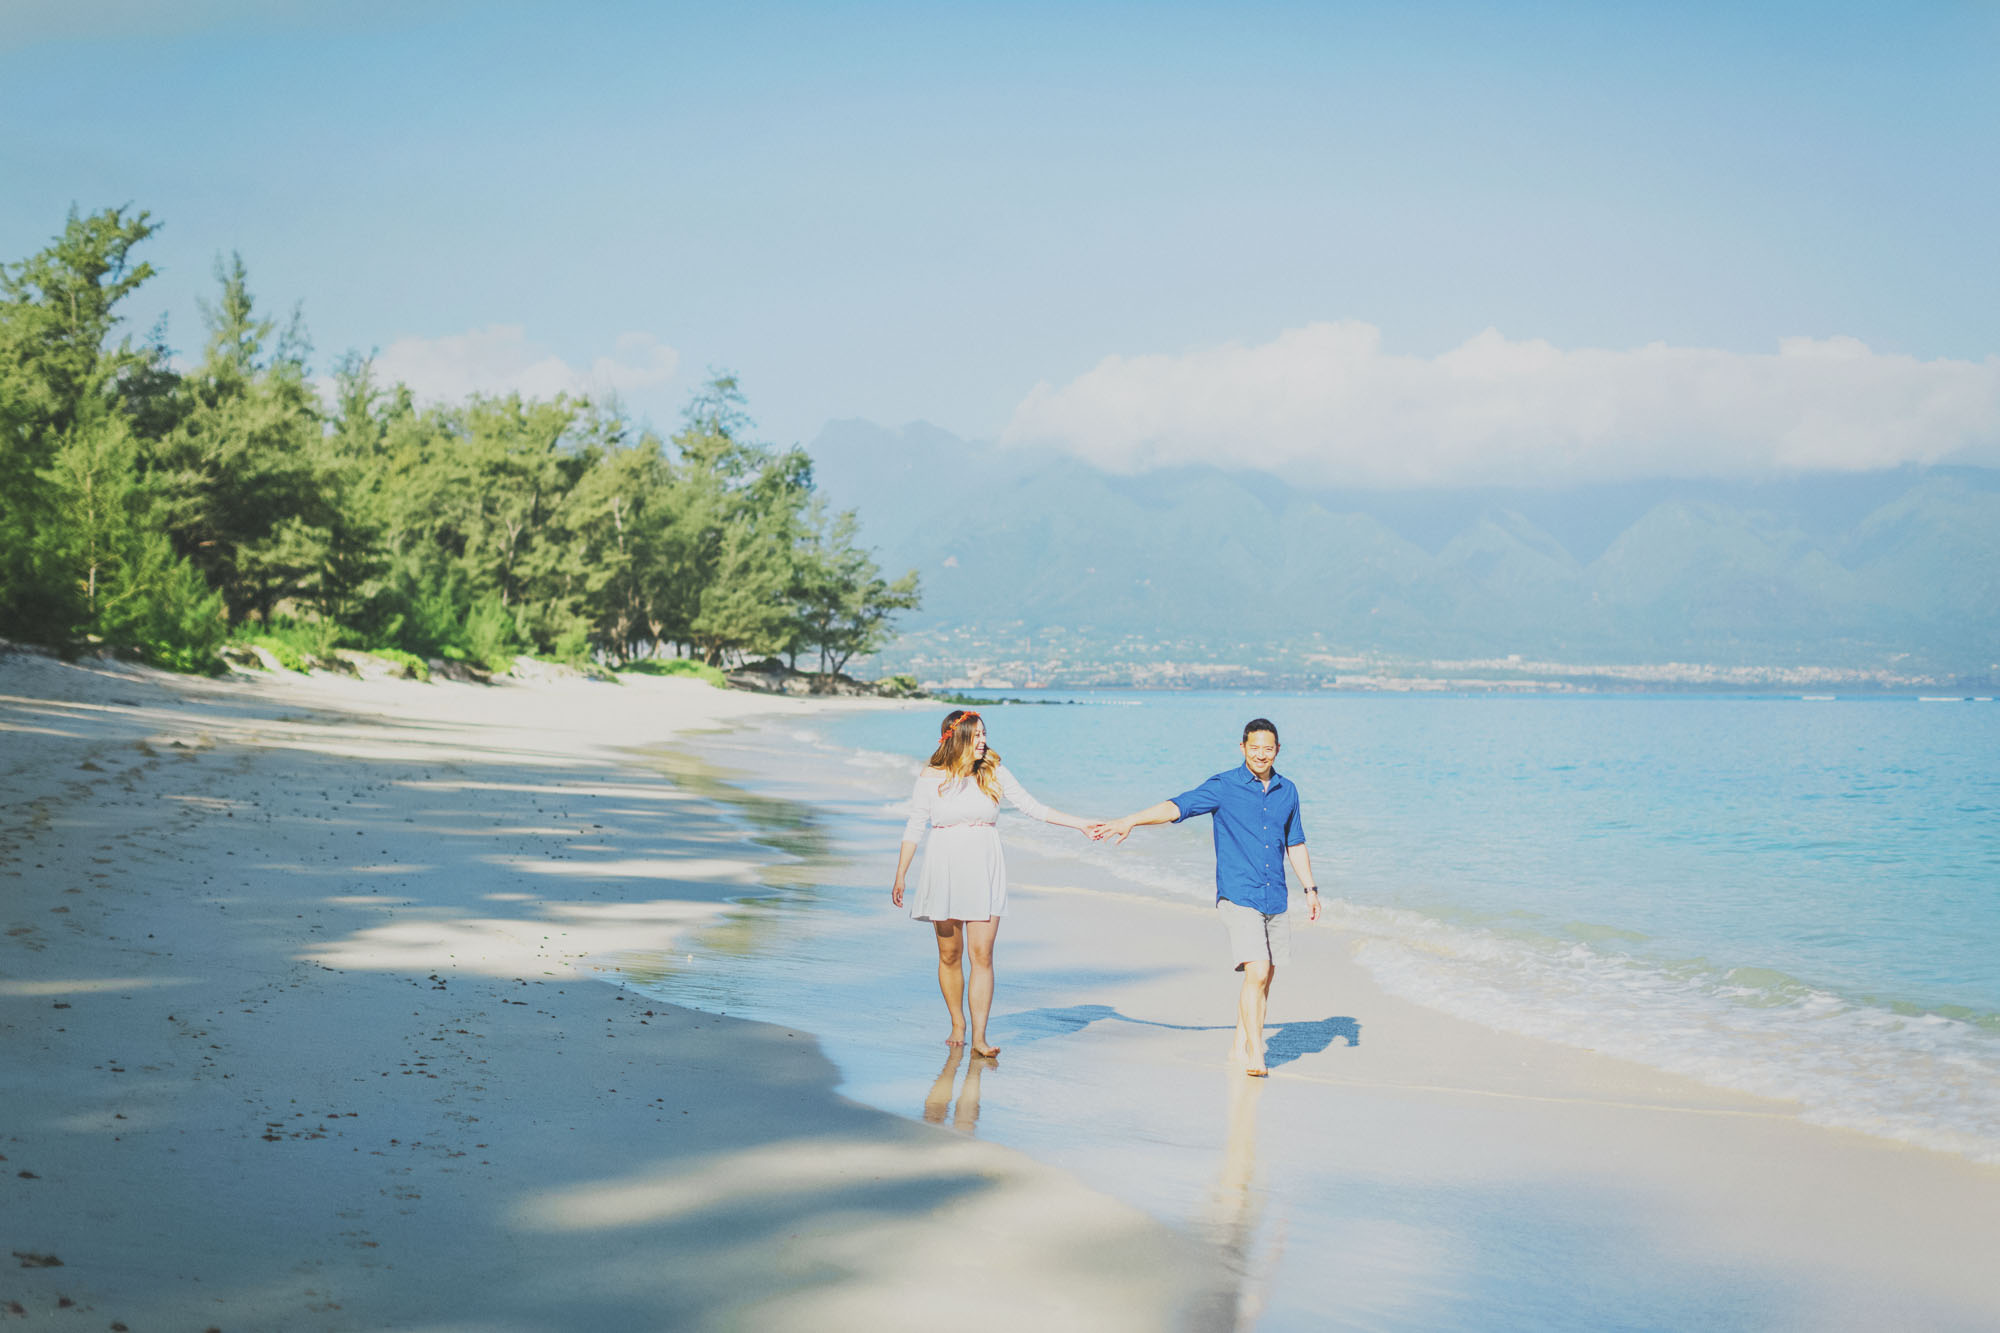 Maui hawaii photographer wedding inspiration_2.jpg